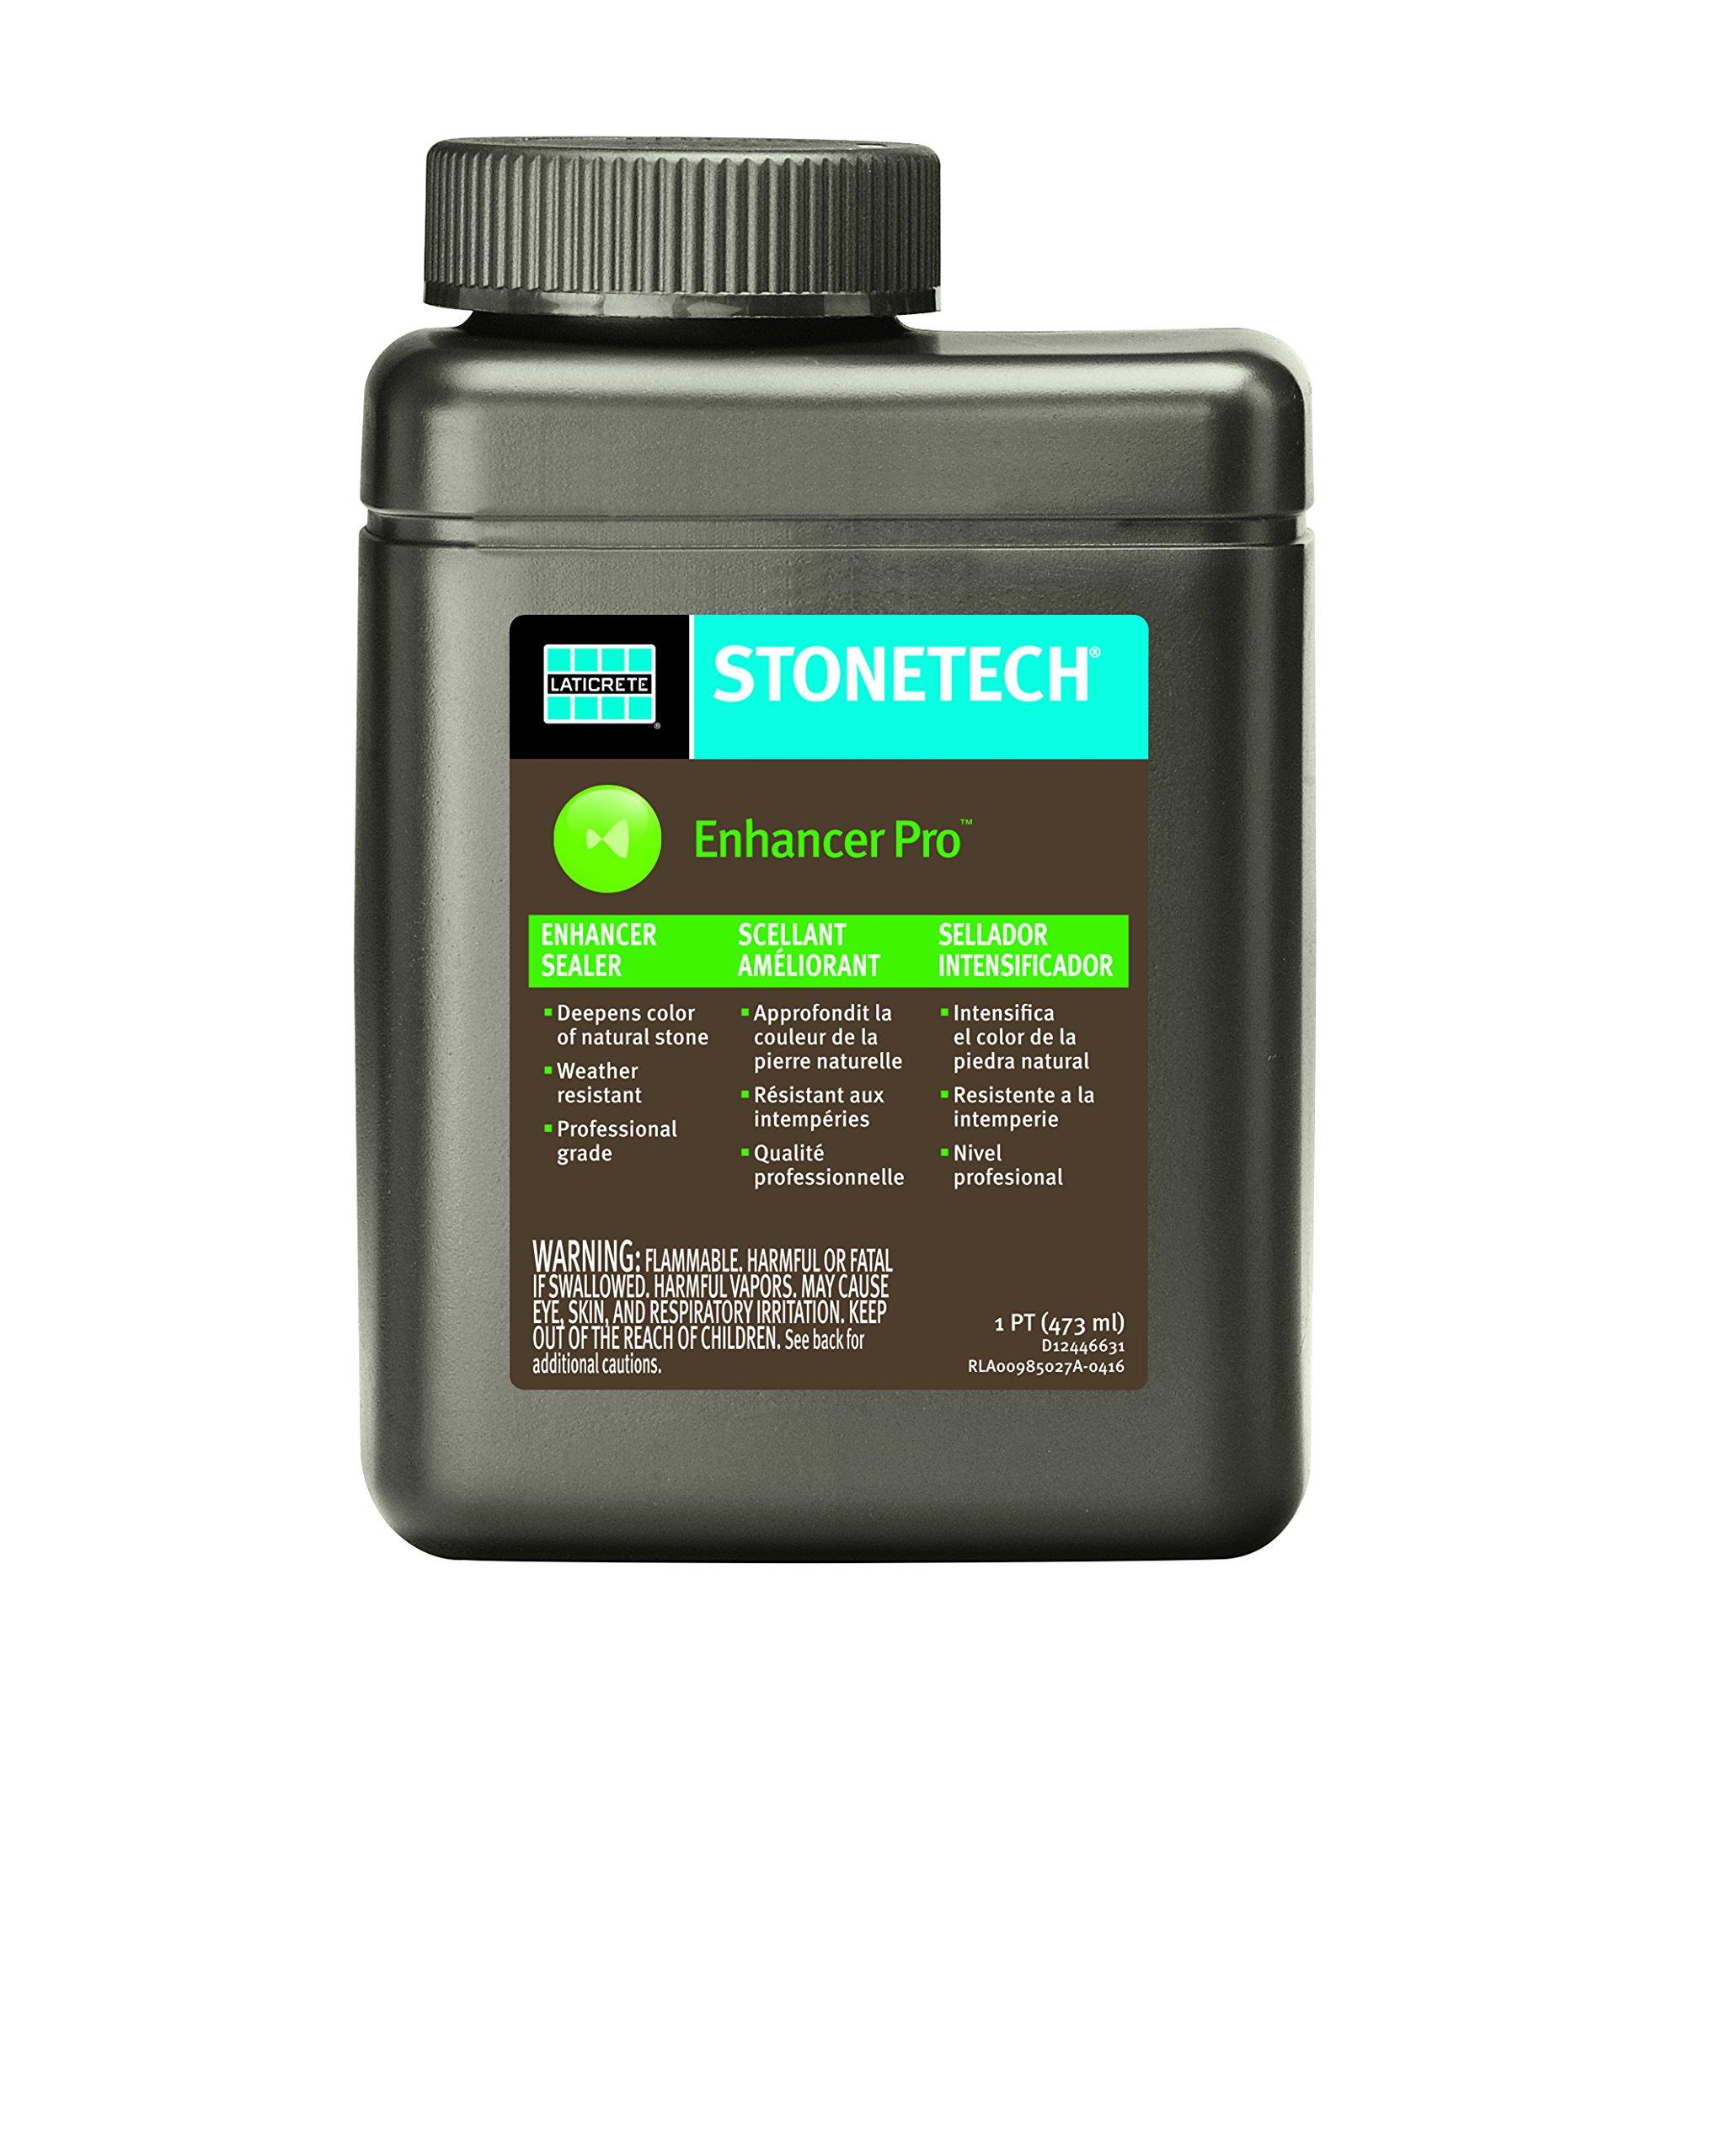 Laticrete Stonetech Enhancer Pro Sealer - 1-Pint by Laticrete